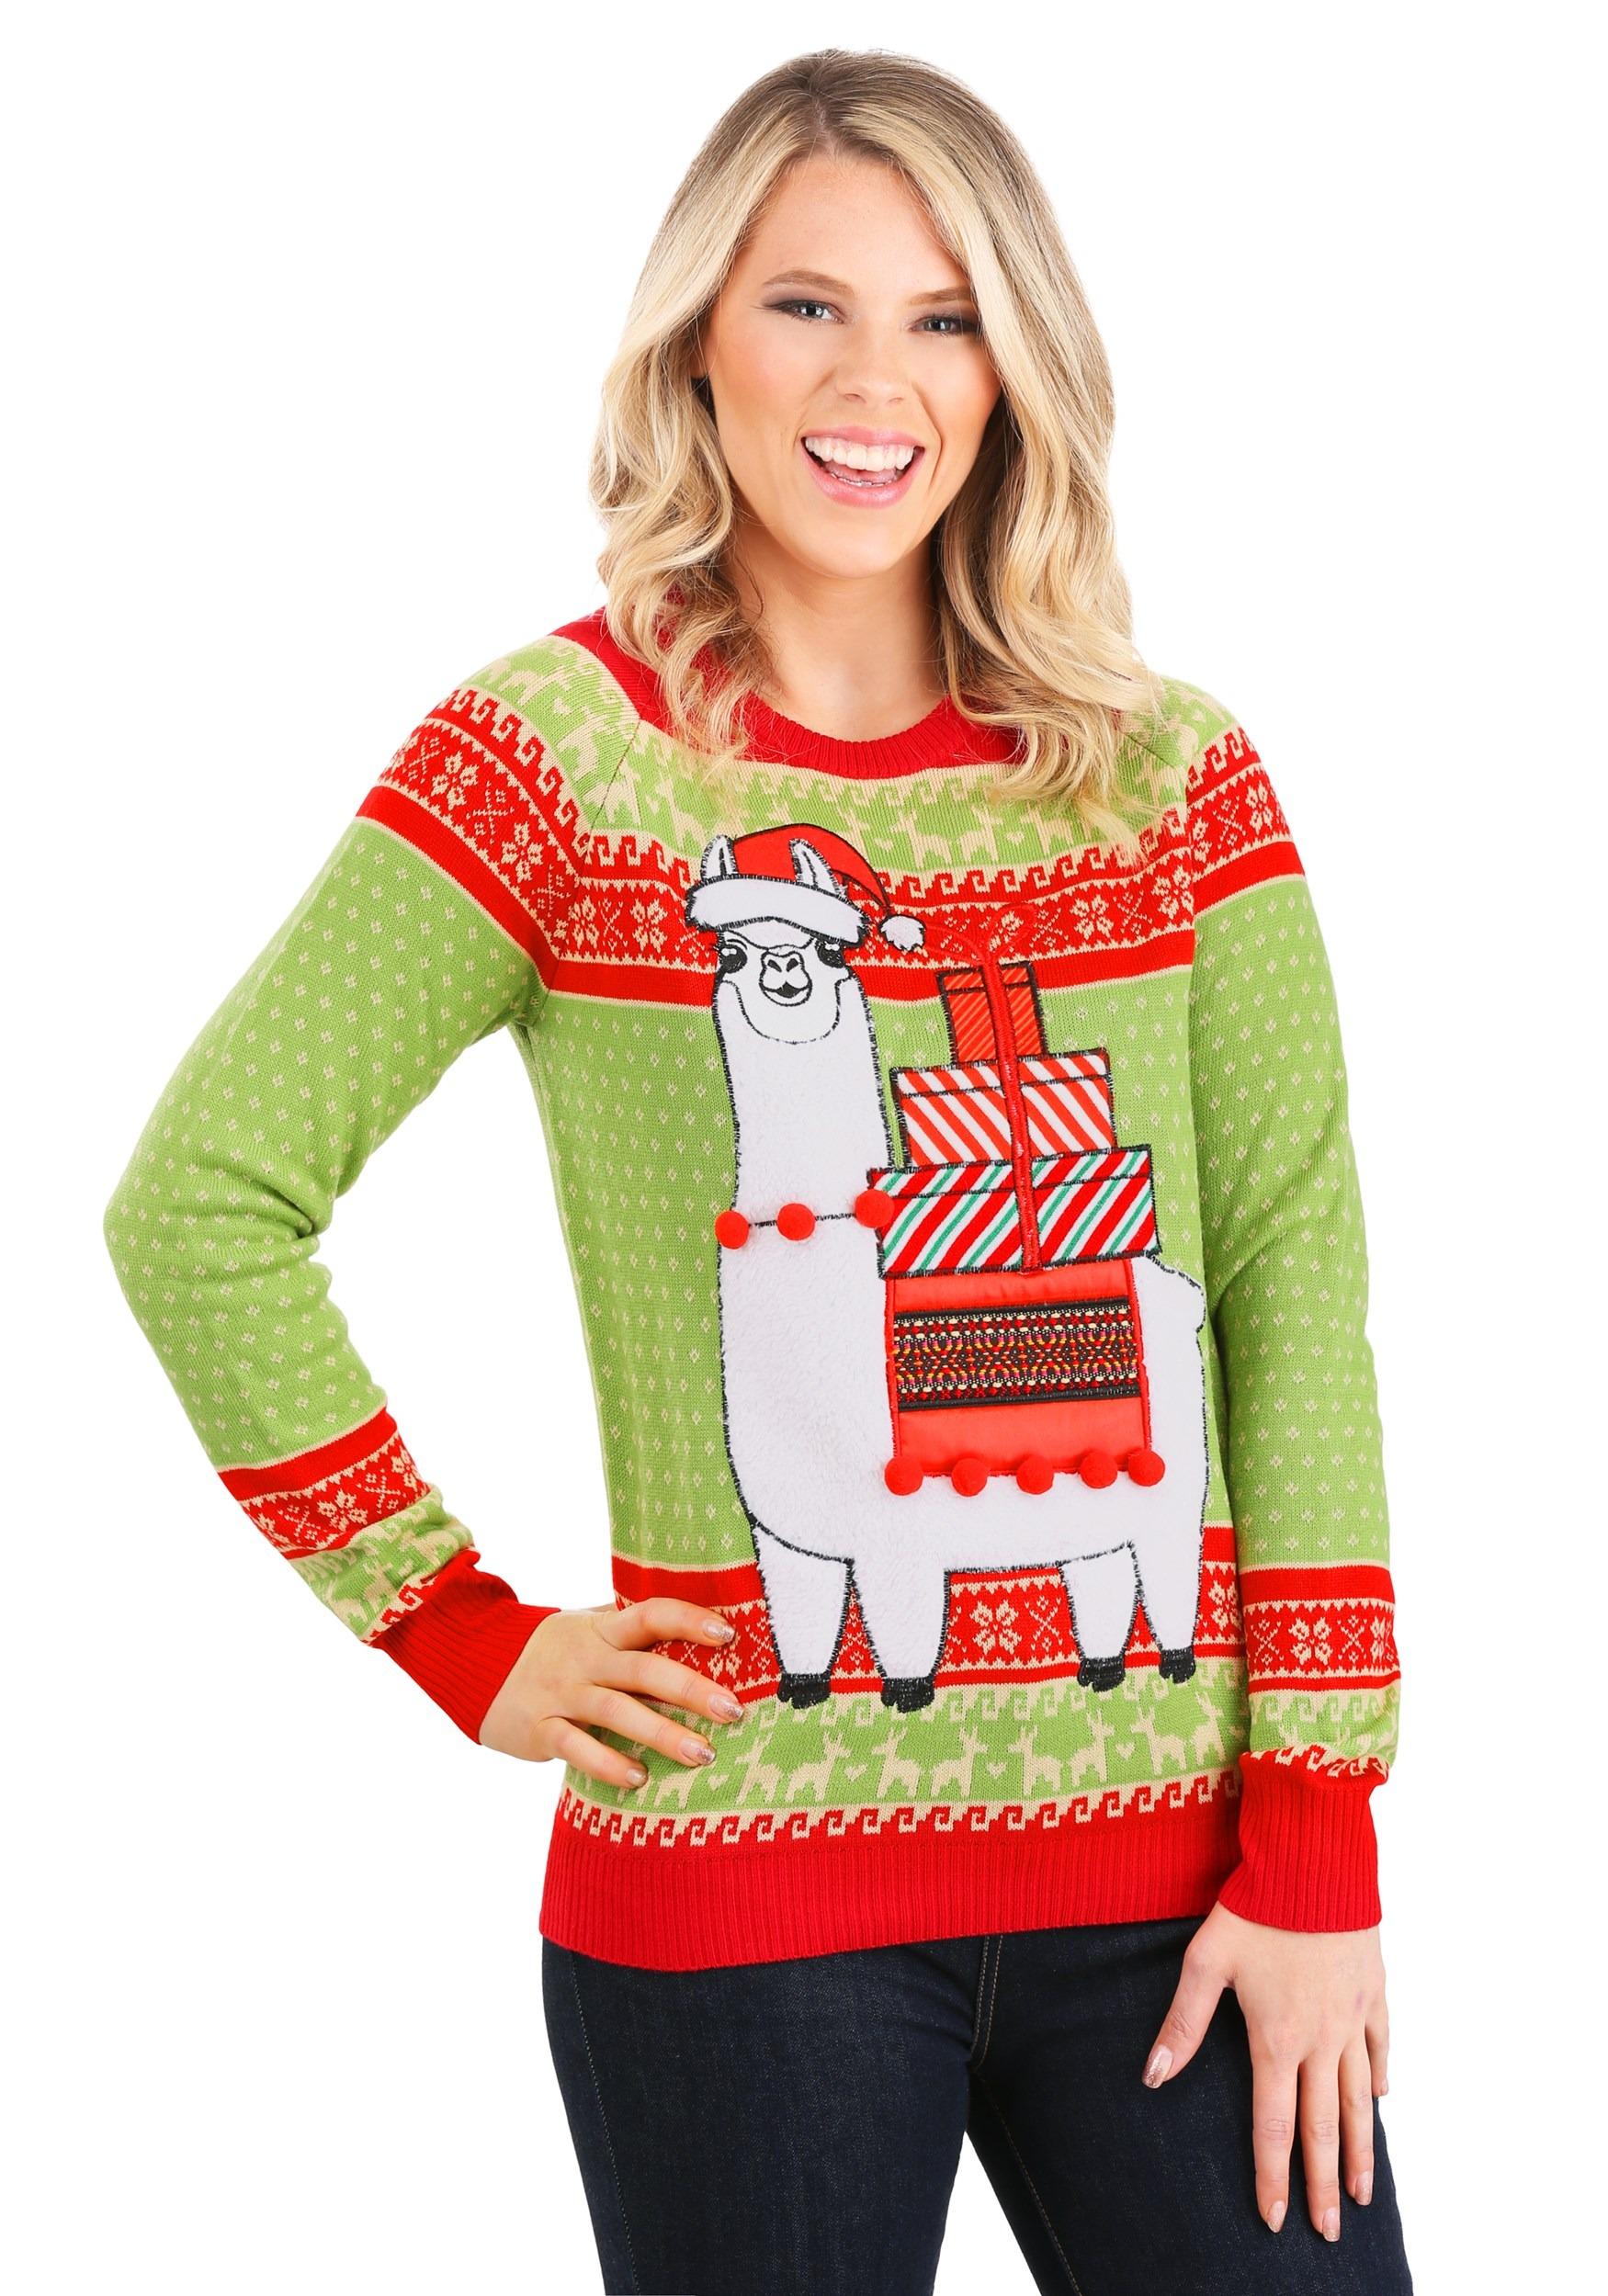 Llama Ugly Sweater Adult Christmas